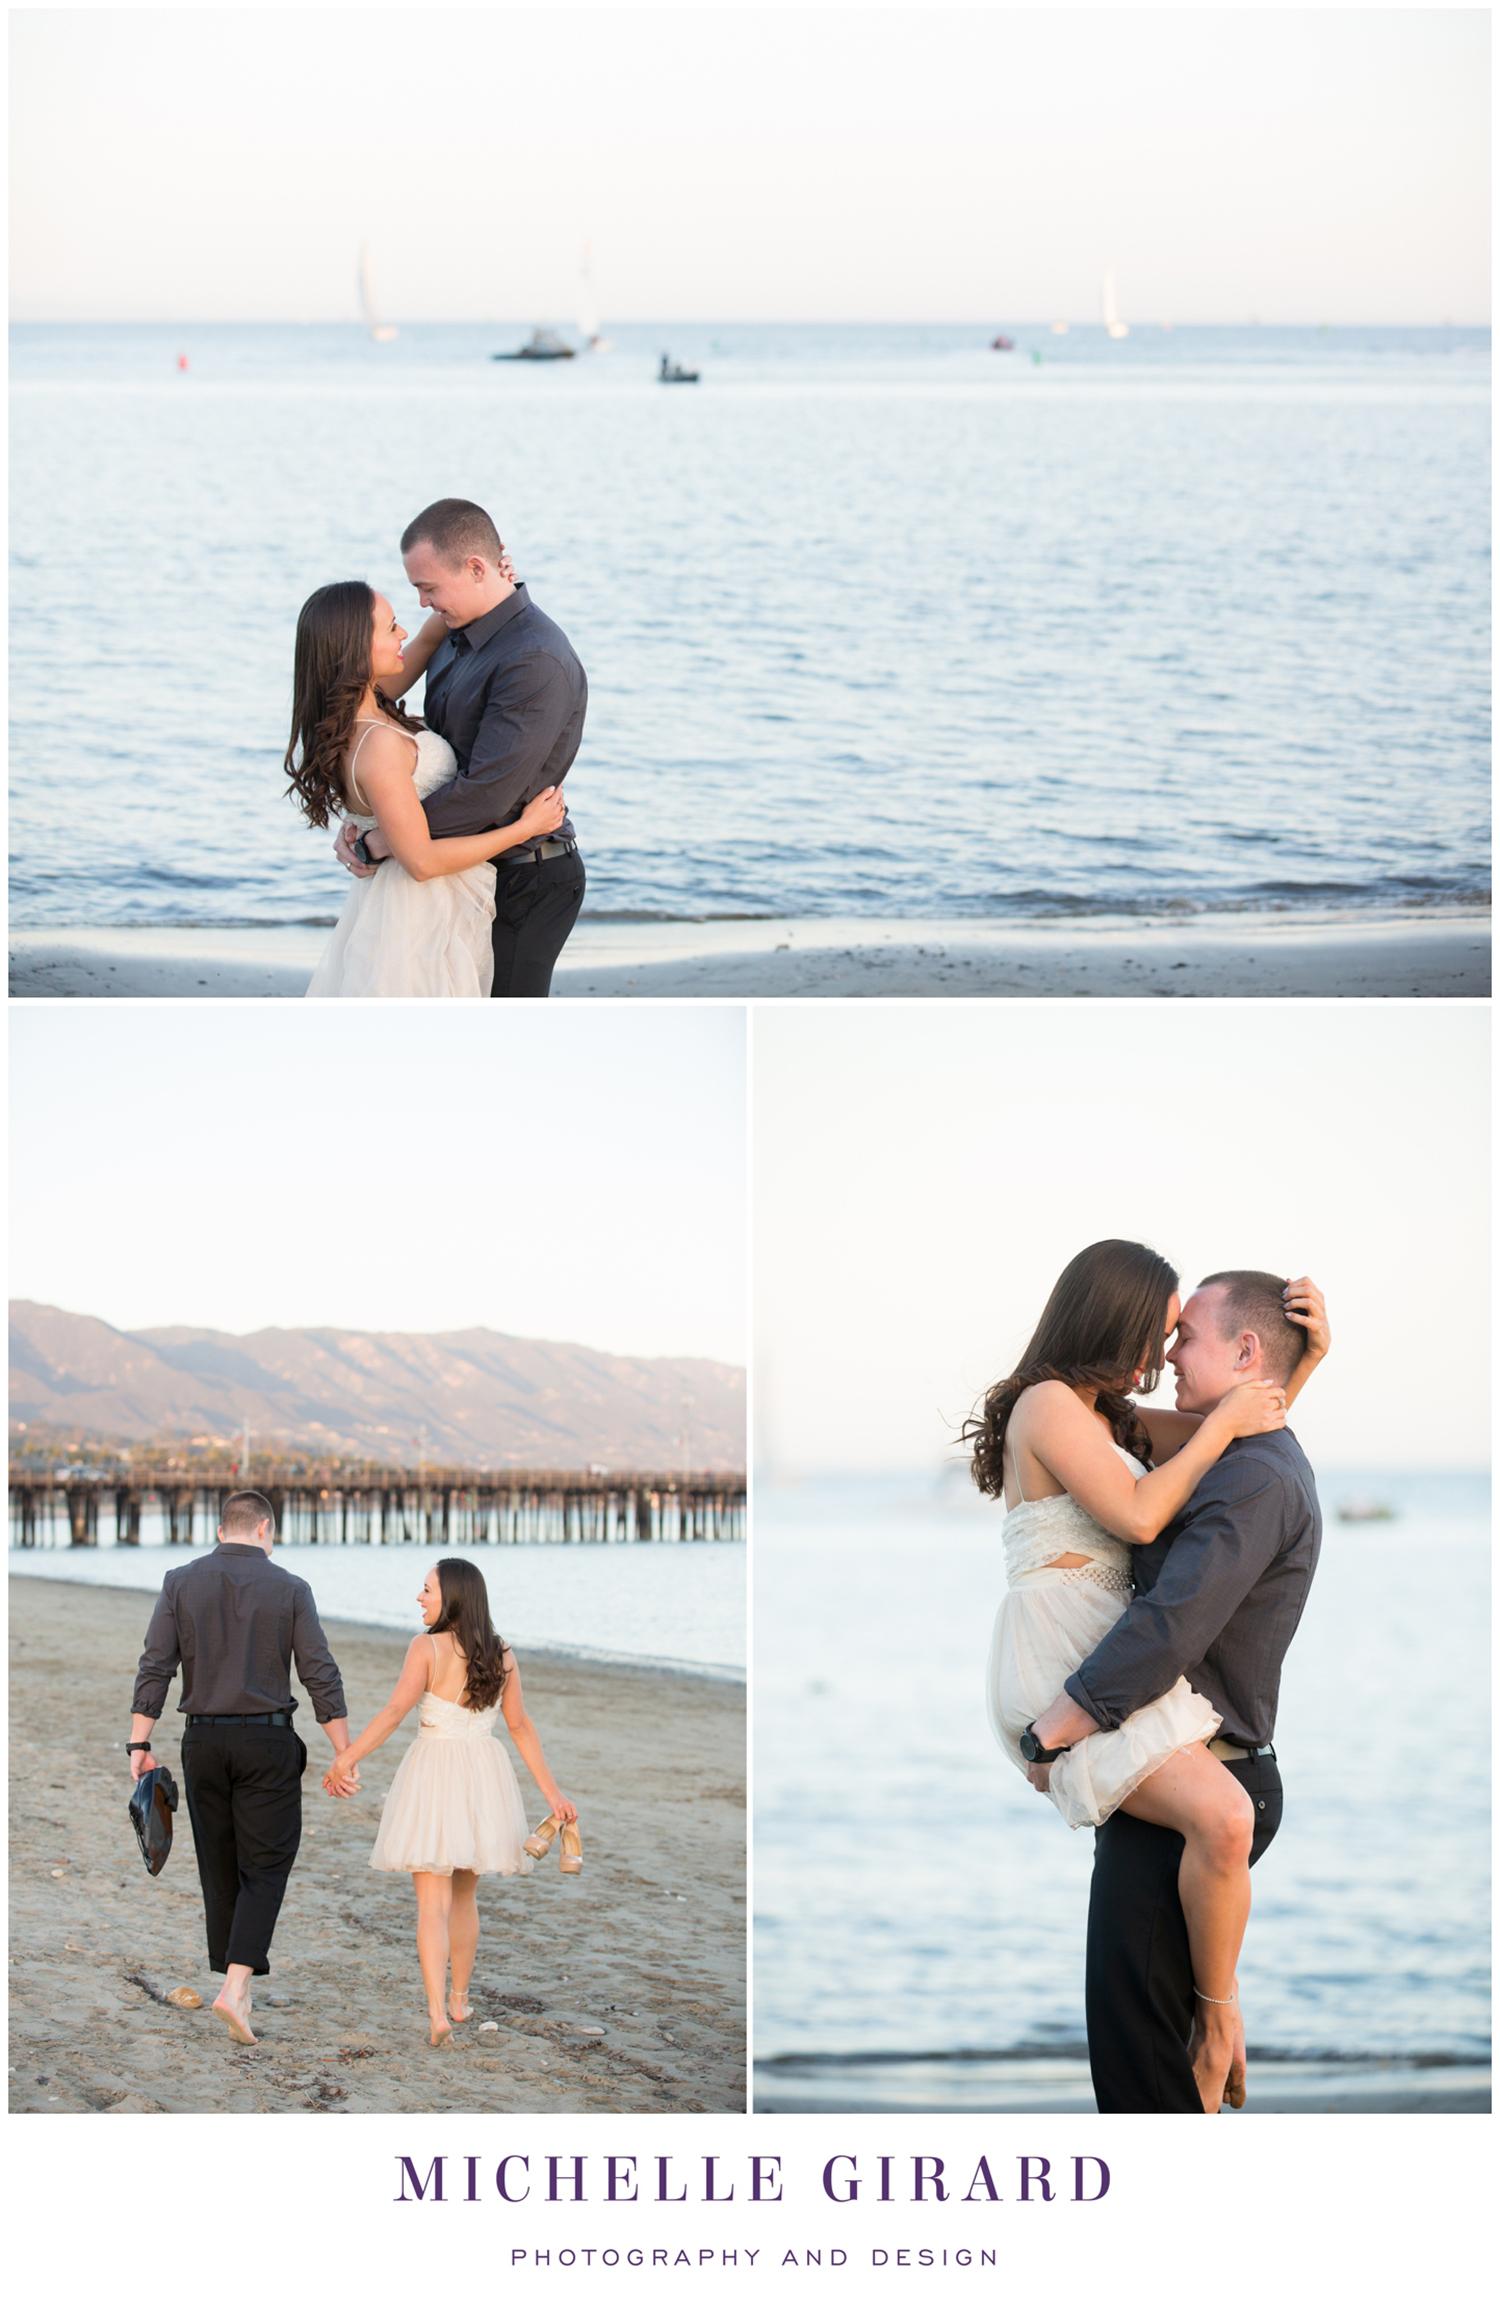 santa-barbara-sunset-beach-elopement-engagement-michelle-girard-photography-01.jpg